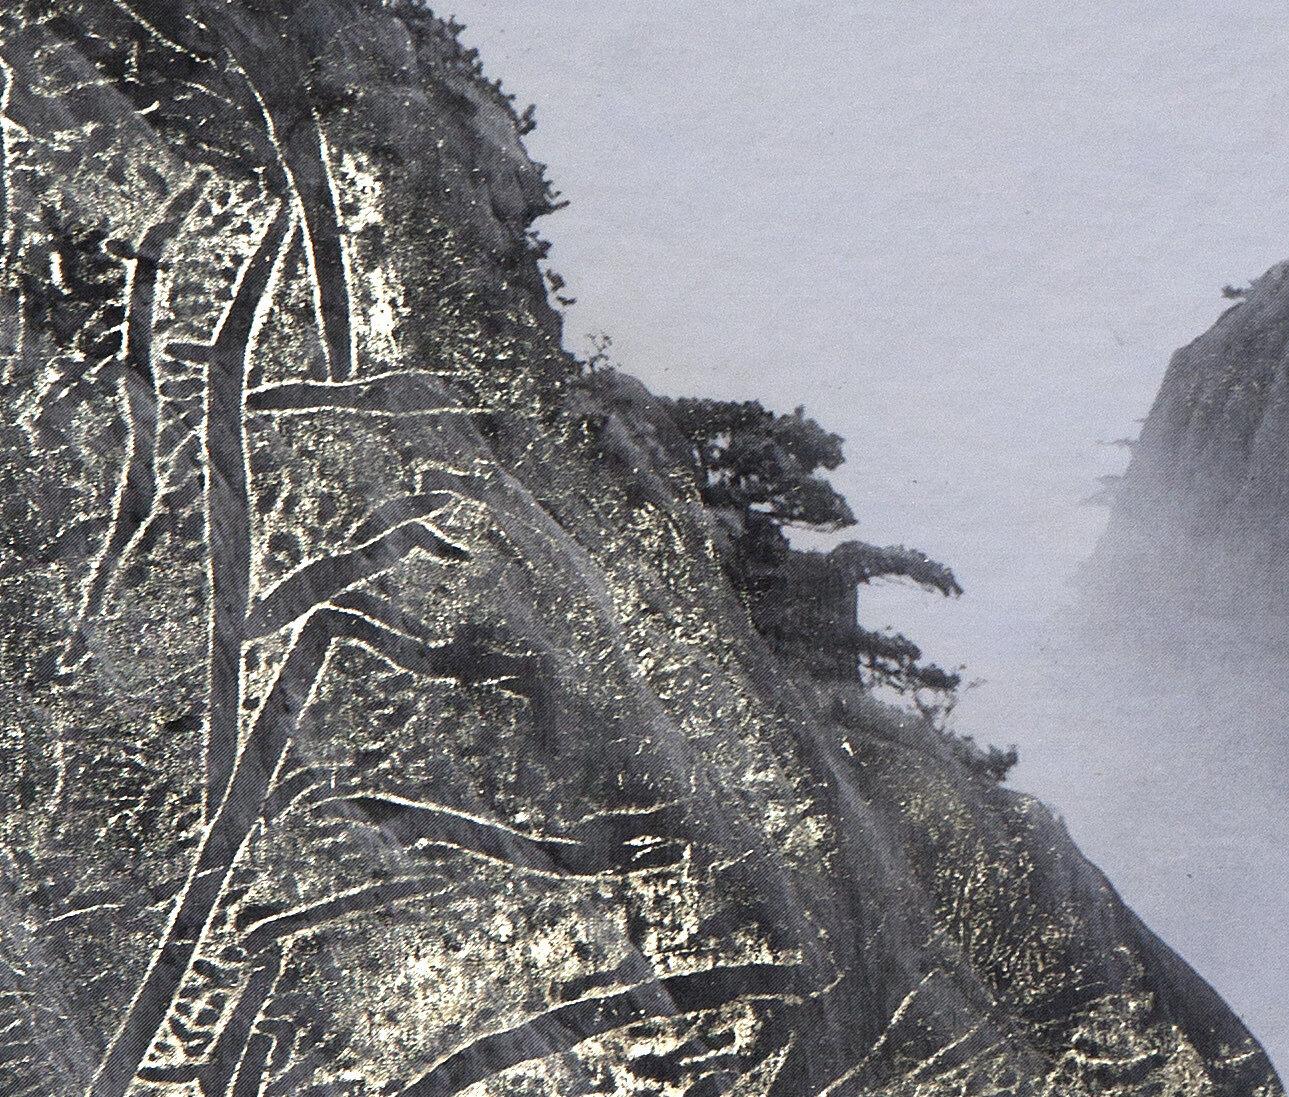 Huangshan Gorge II (section)